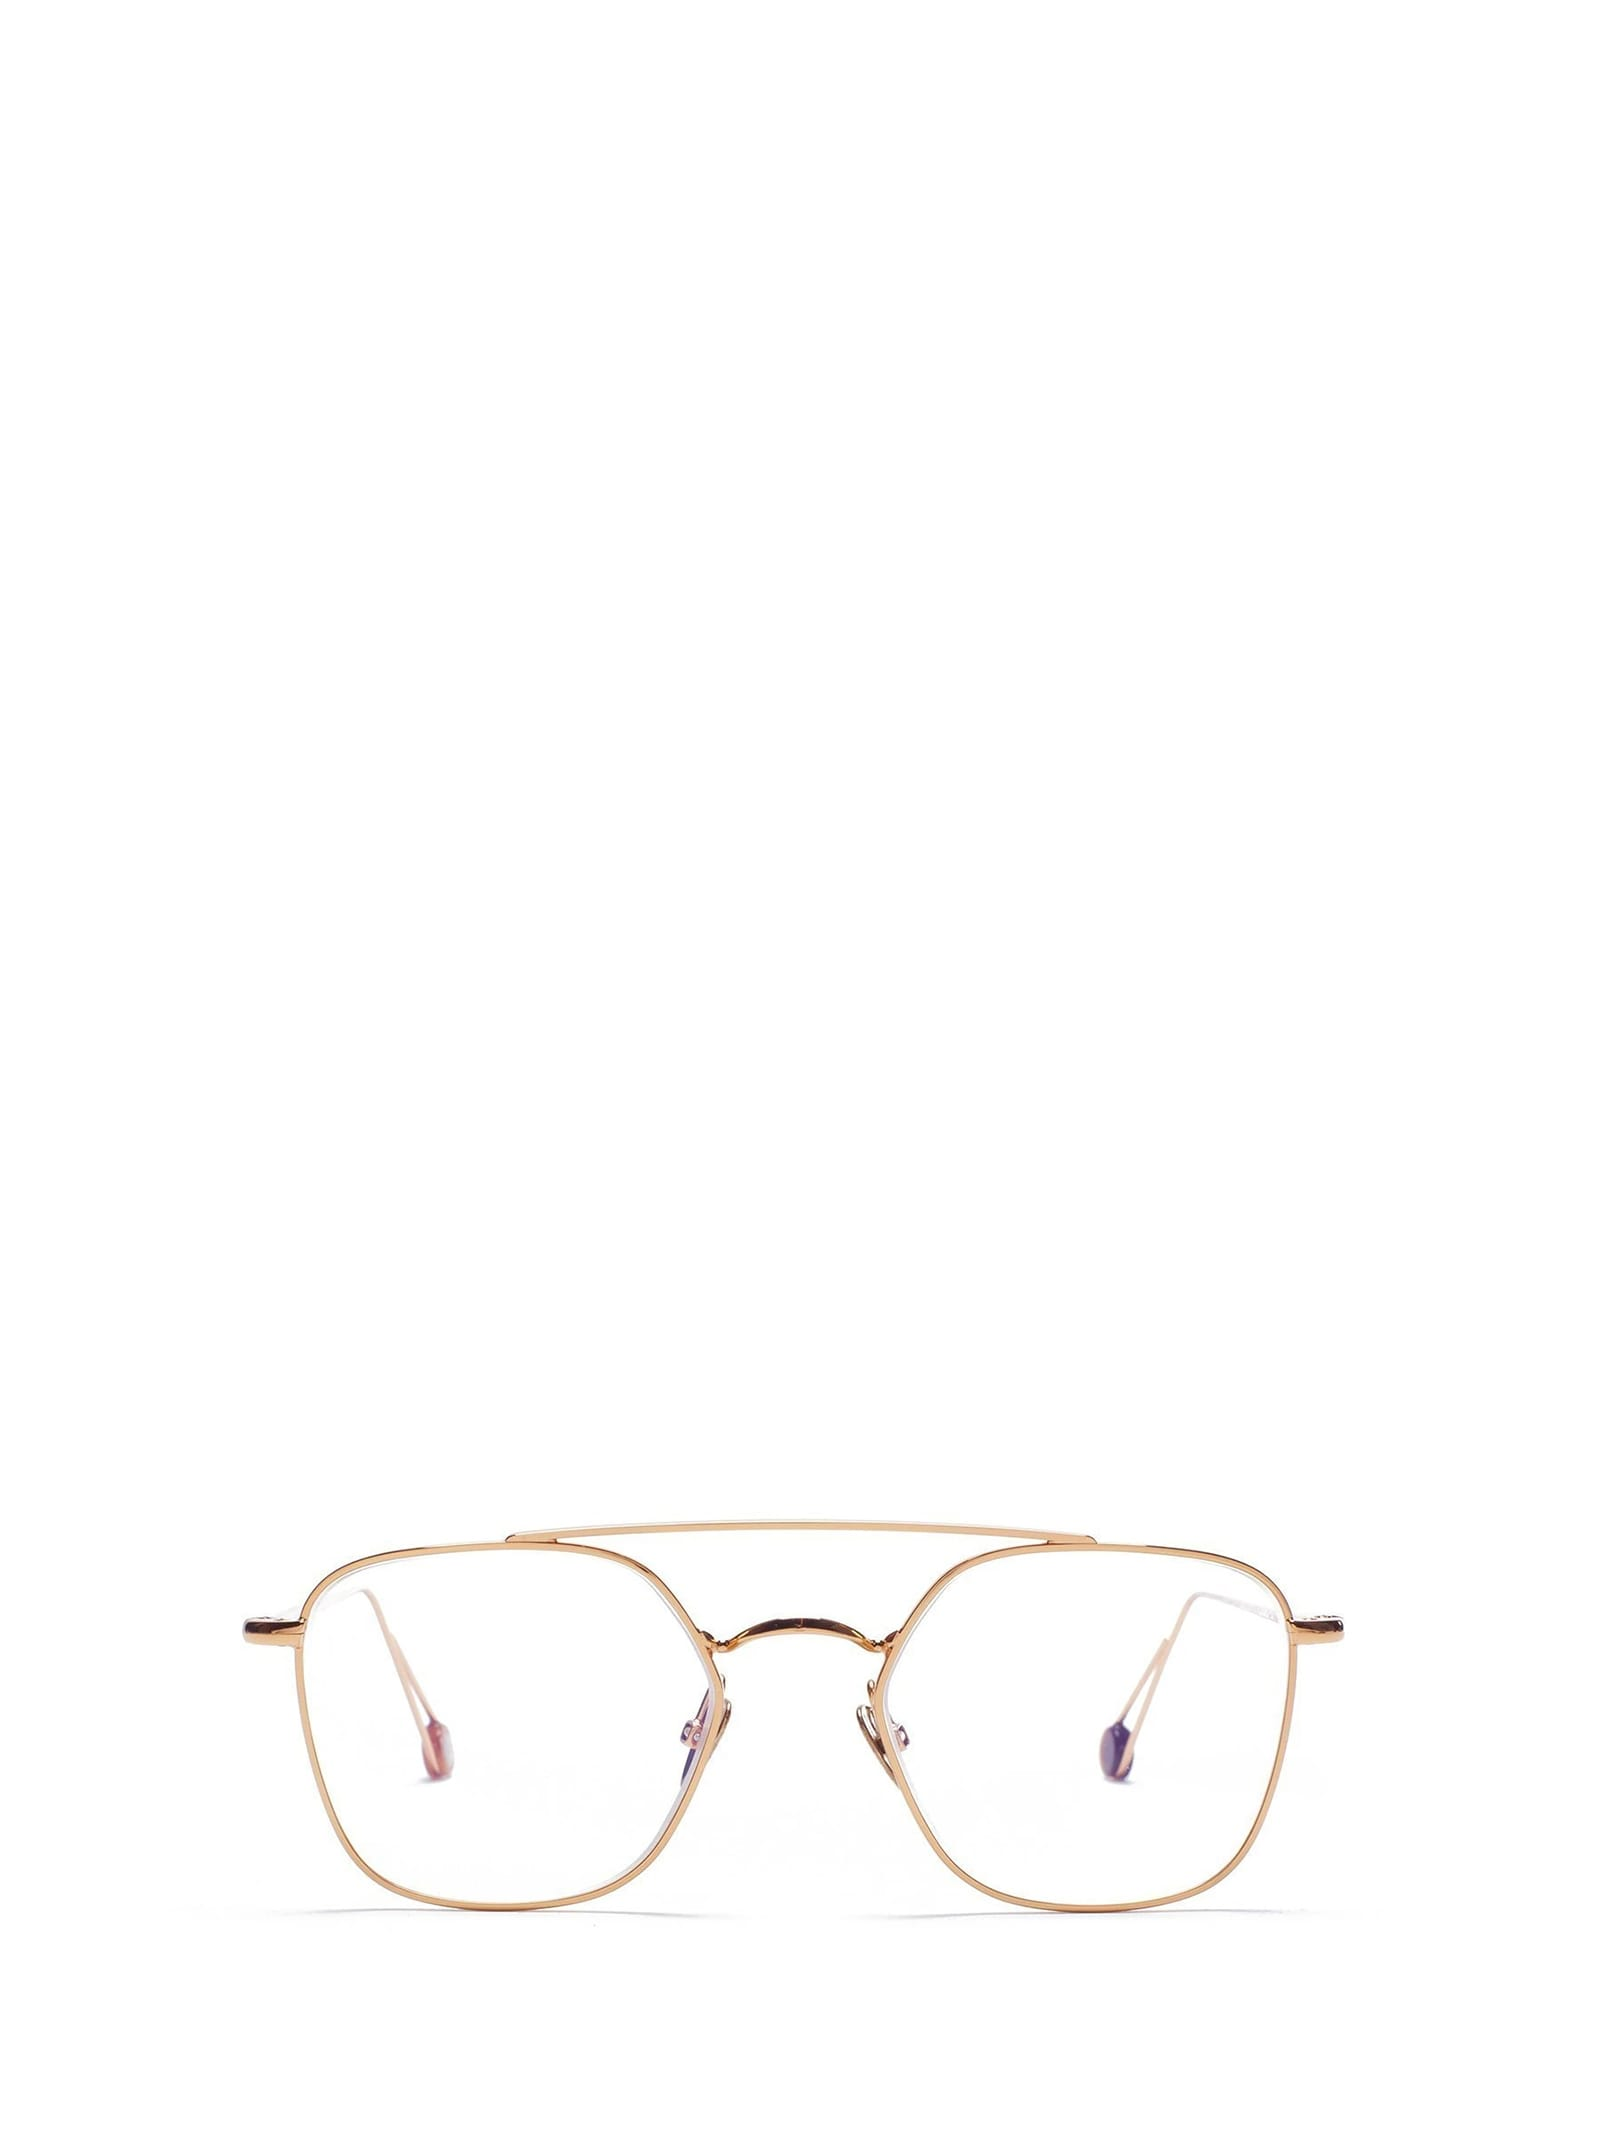 AHLEM Ahlem Place Colette Optic Peony Gold Glasses